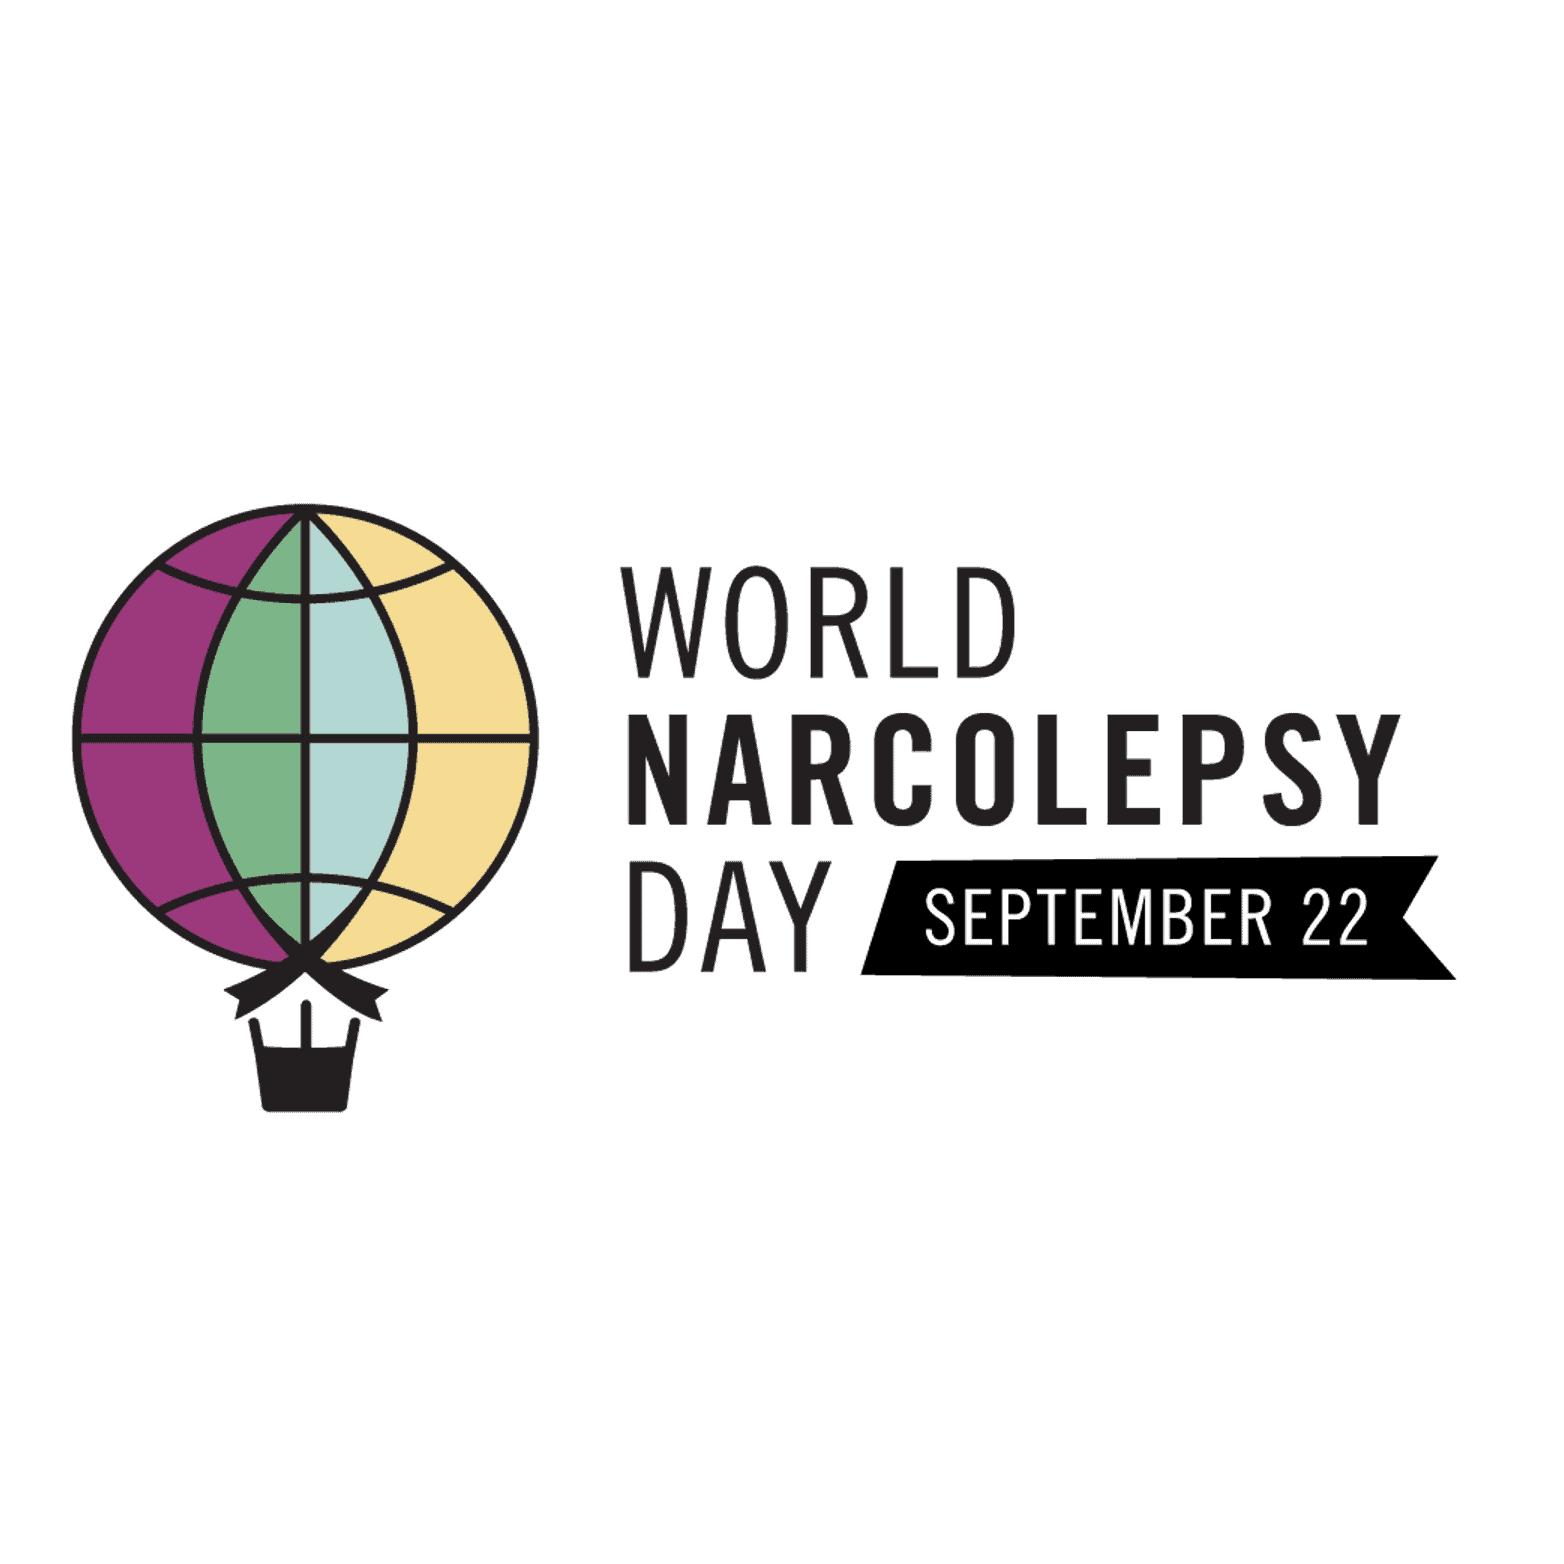 World Narcolepsy Day September 22 Logo